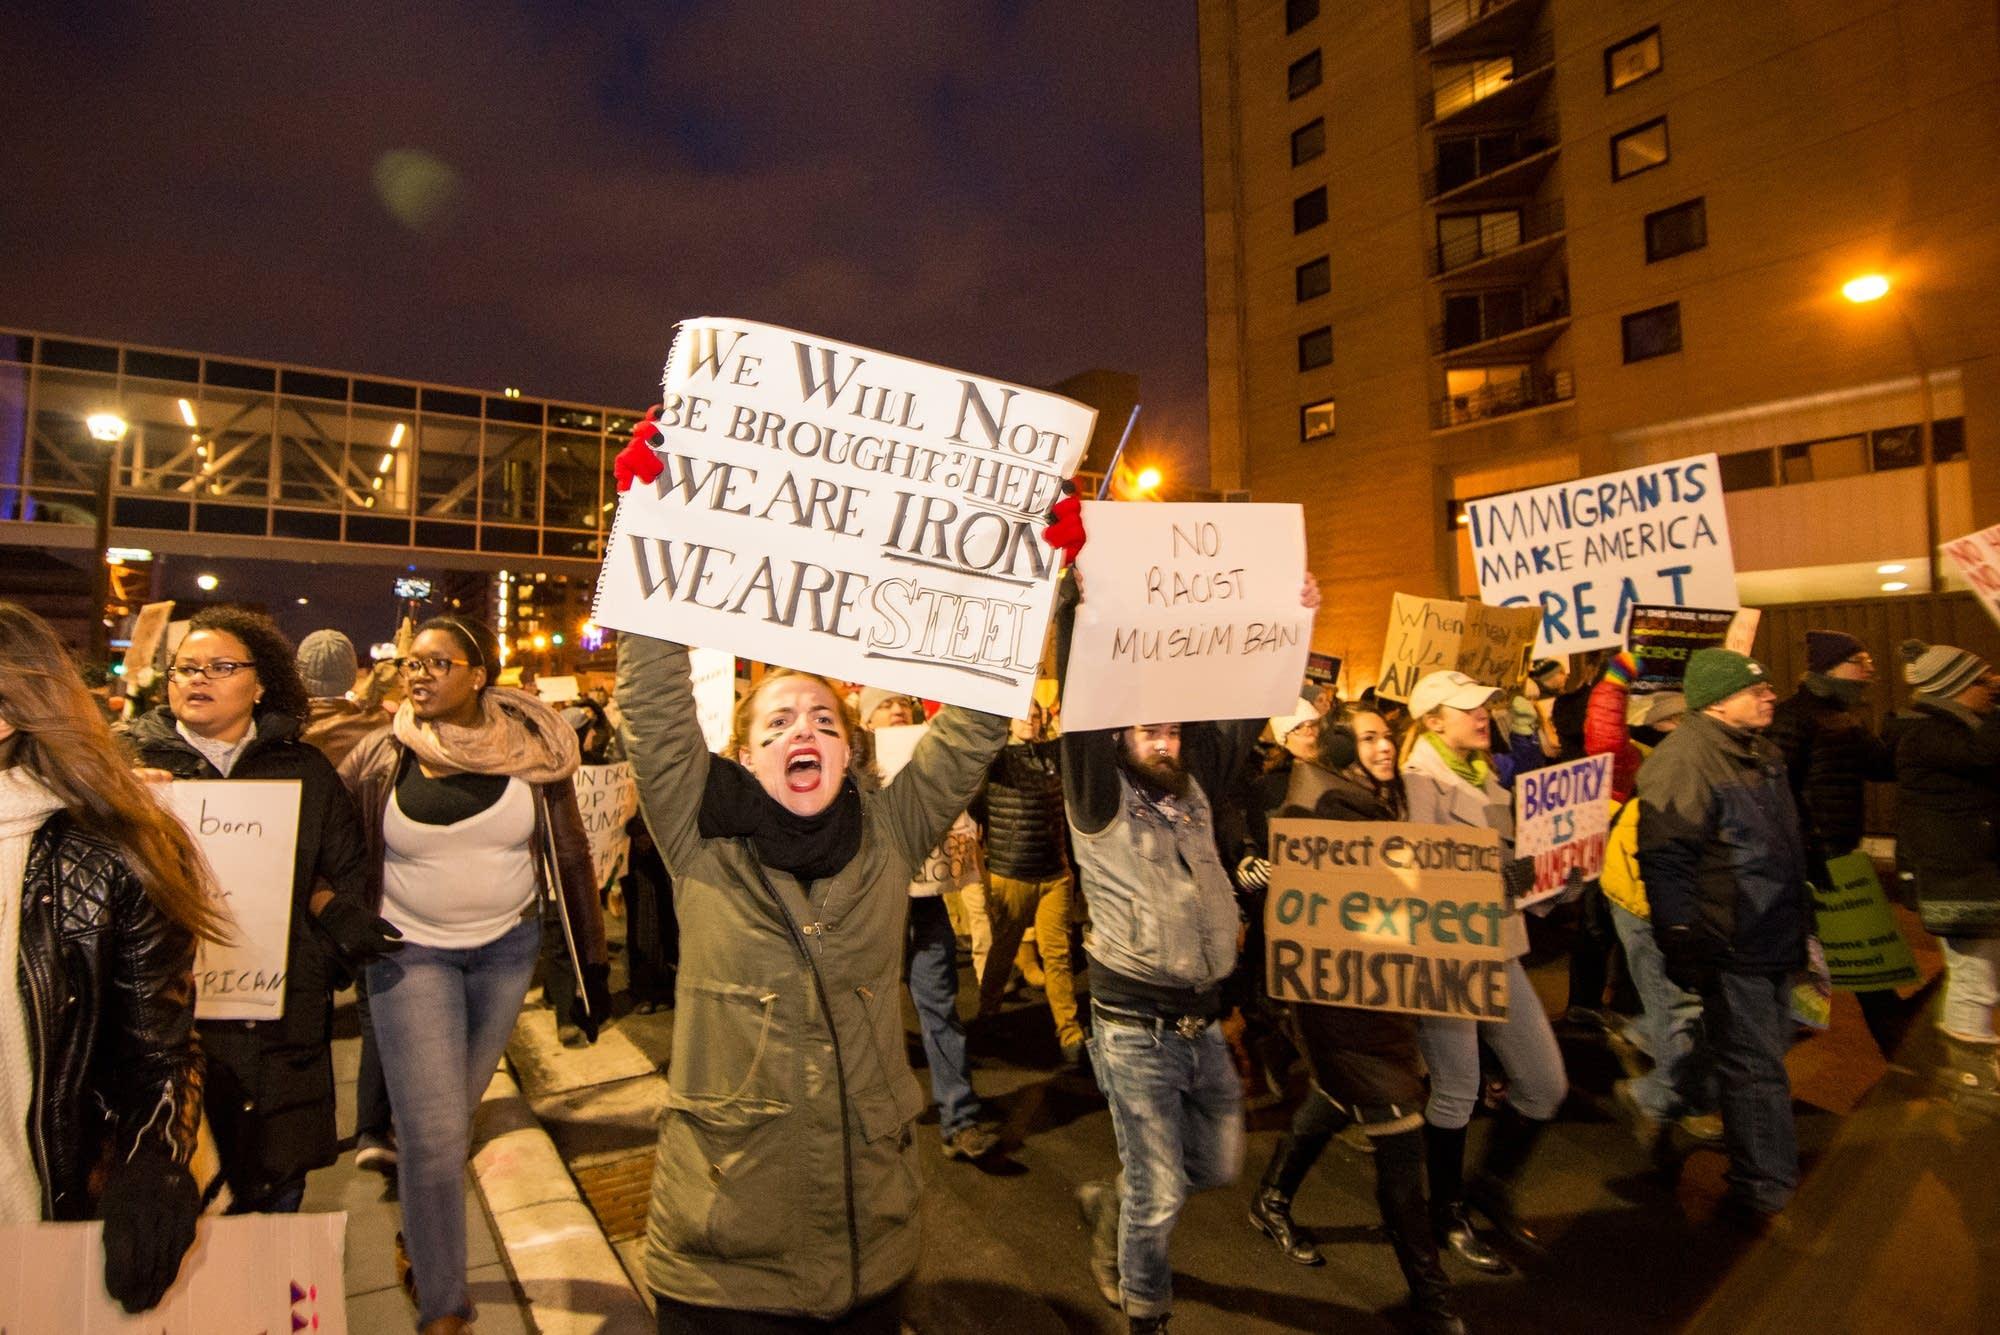 Protesters make their way down Washington Avenue